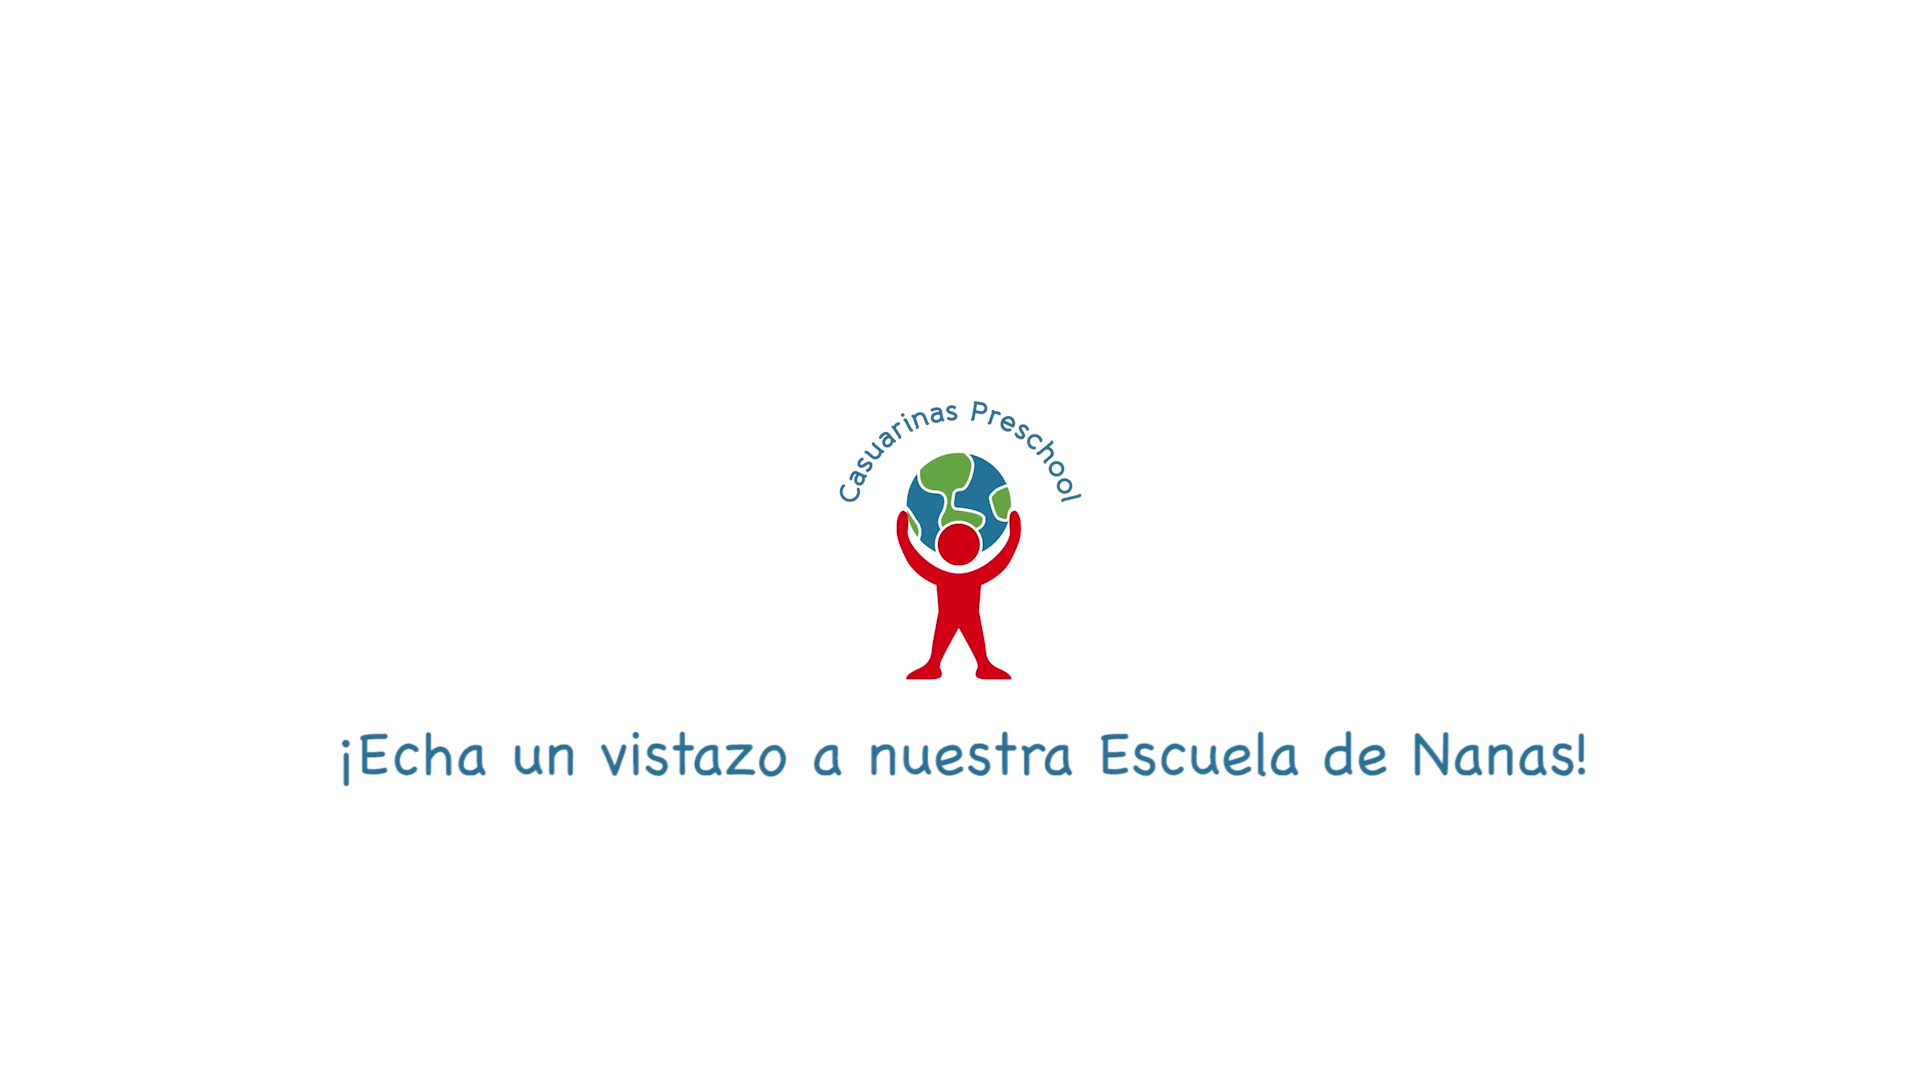 NIDO - ESCUELA DE NANAS